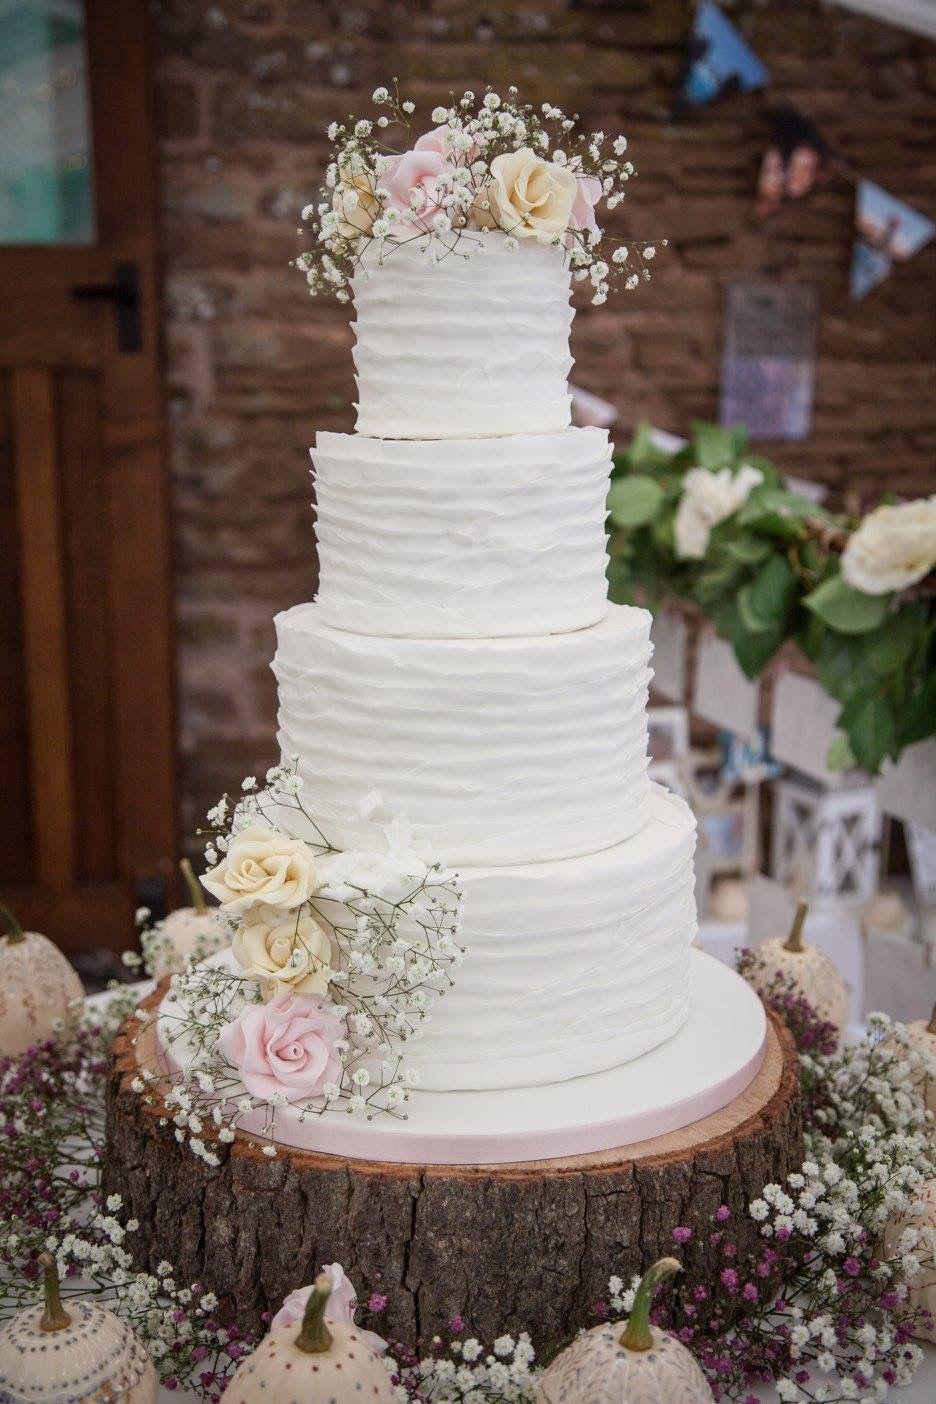 Pin by Cleo on Wedding cake   Pinterest   Wedding venues, Wedding ...